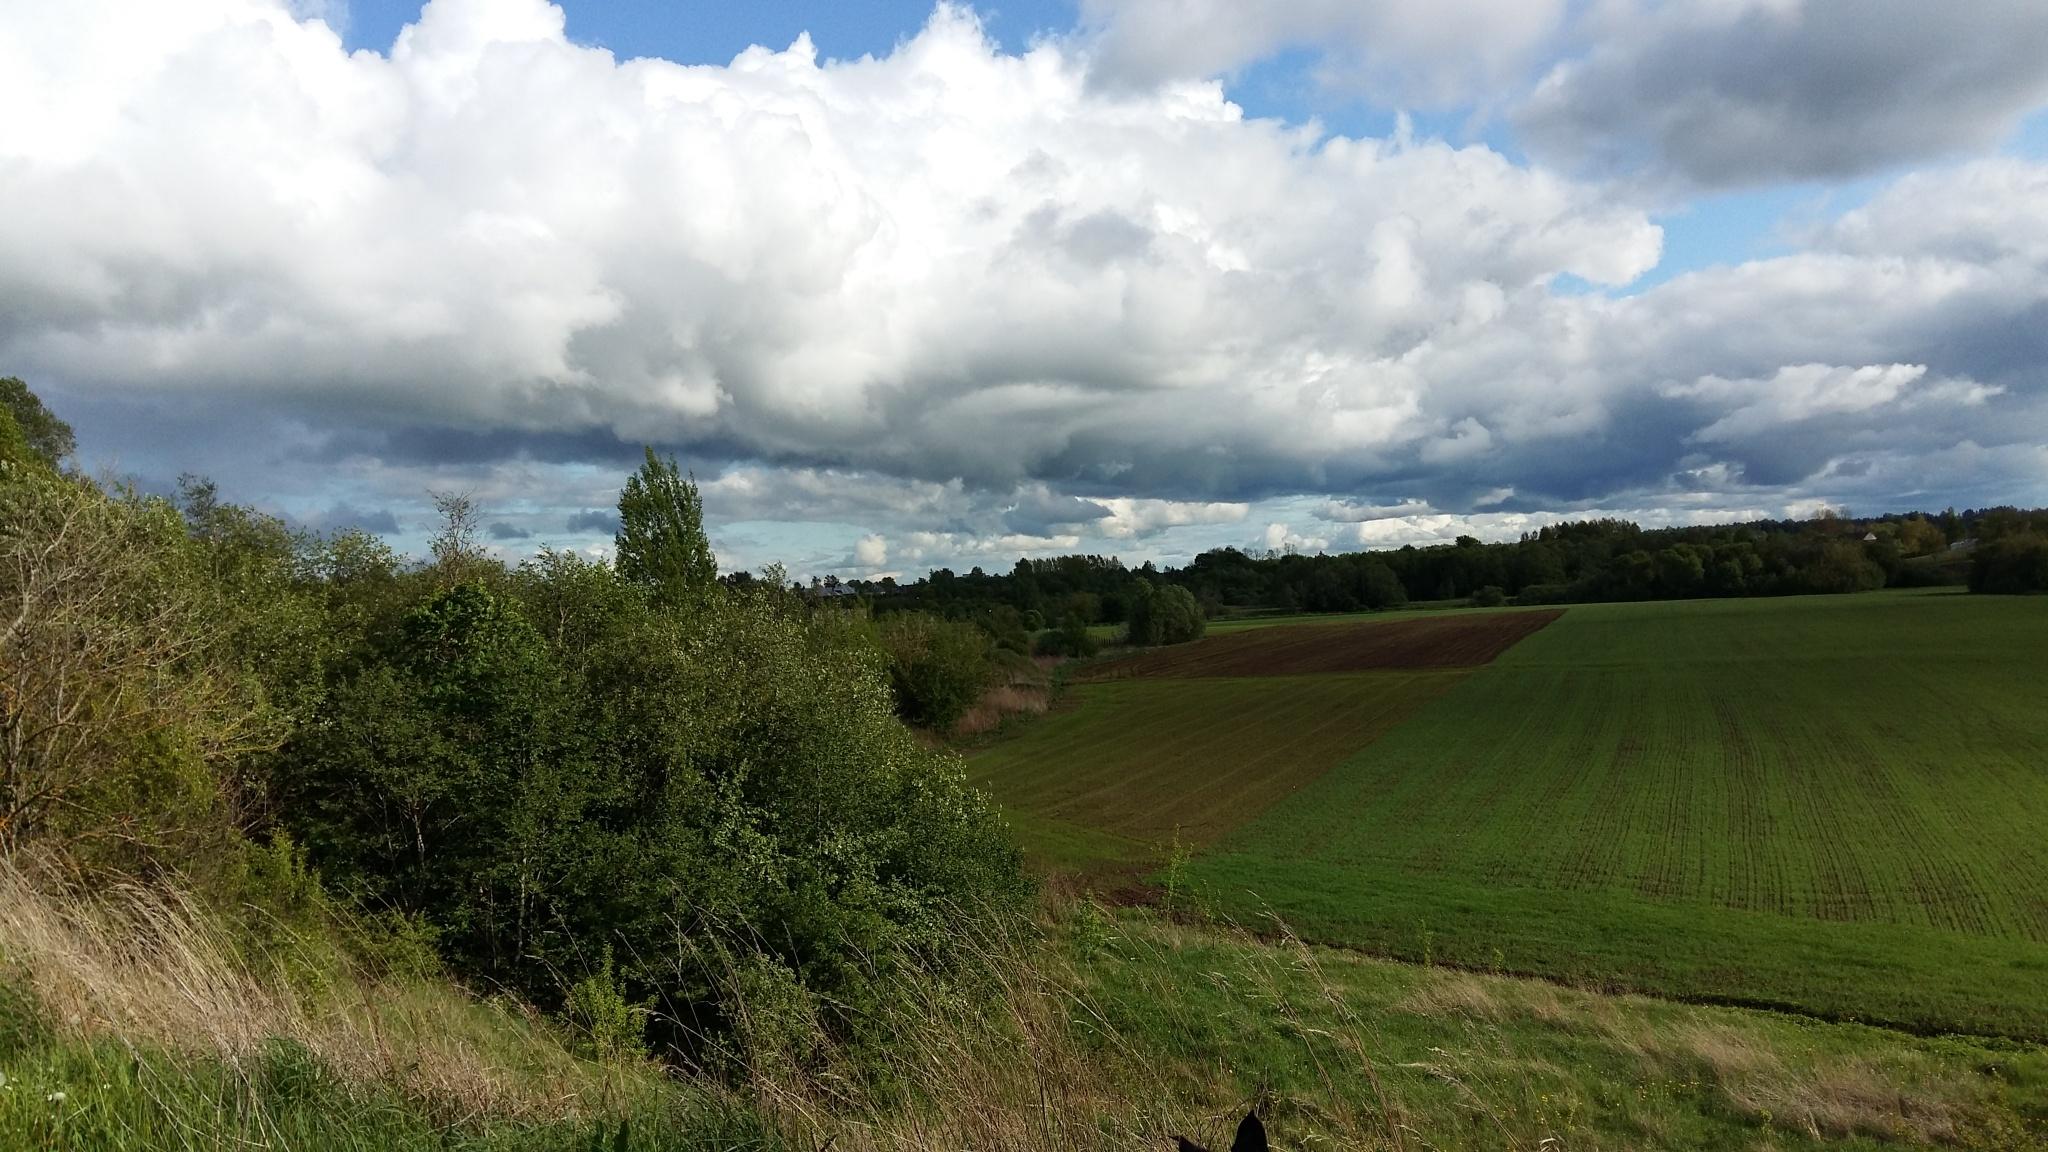 Landscape. by uzkuraitiene62